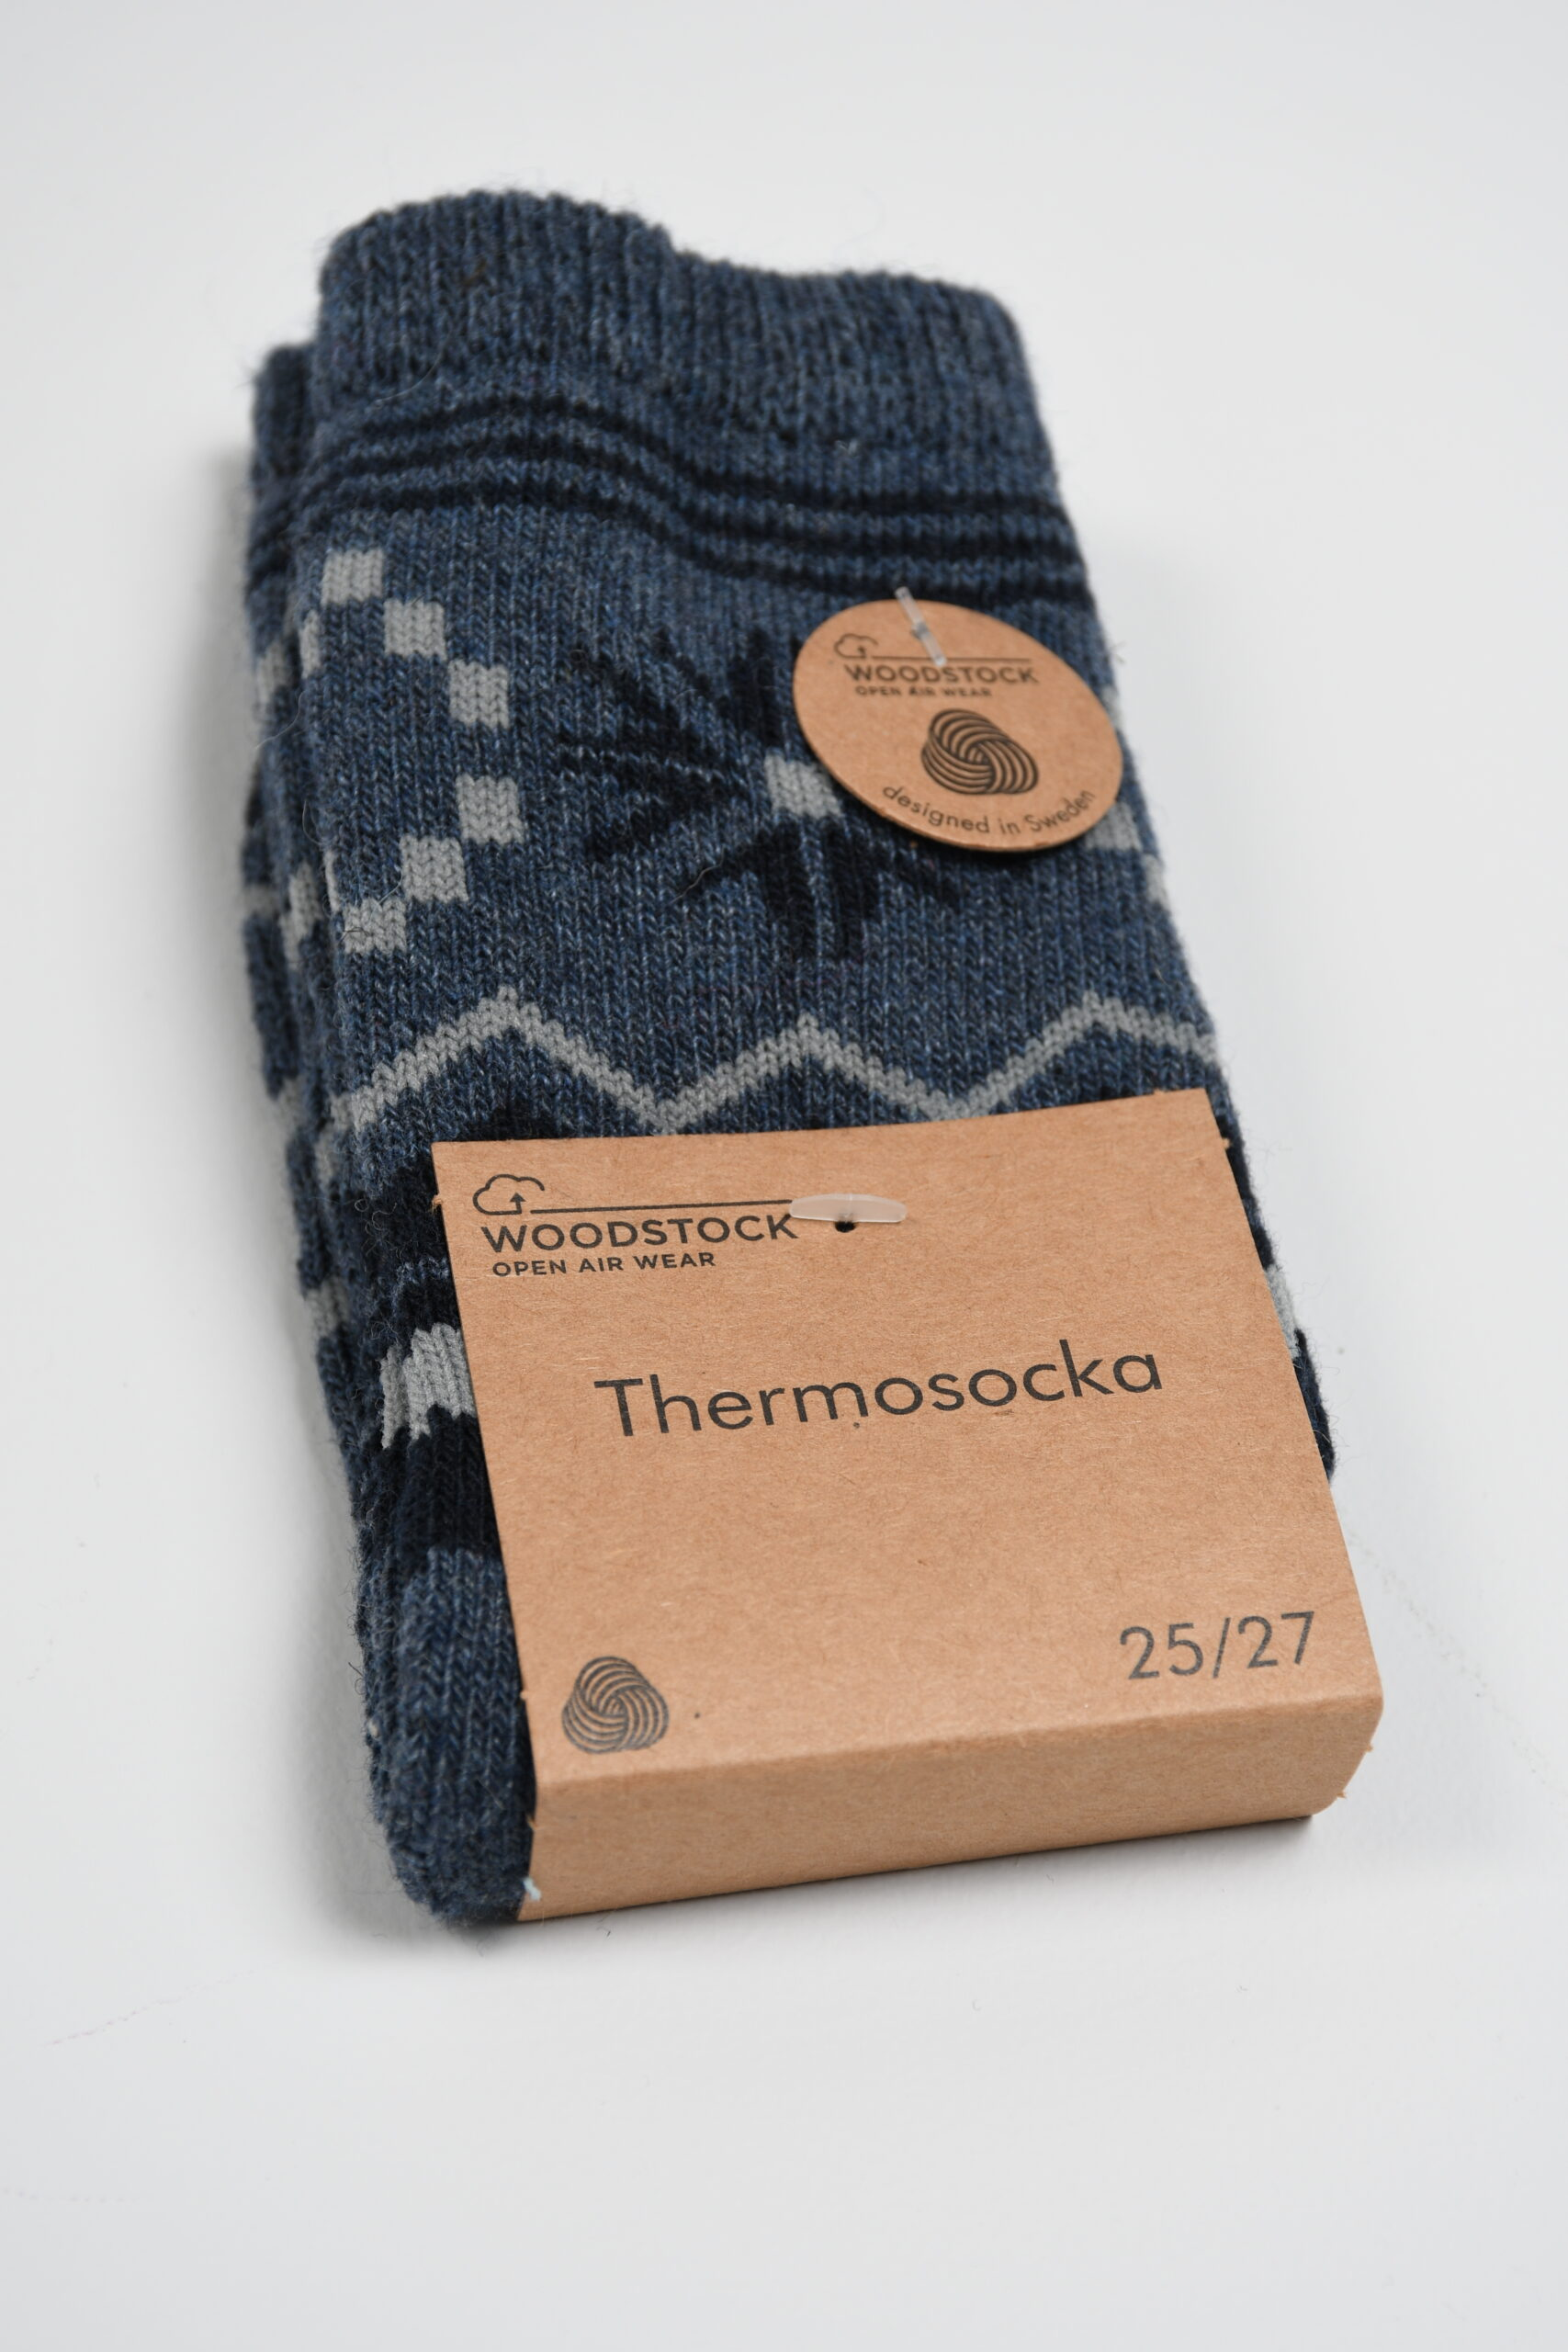 Thermosock